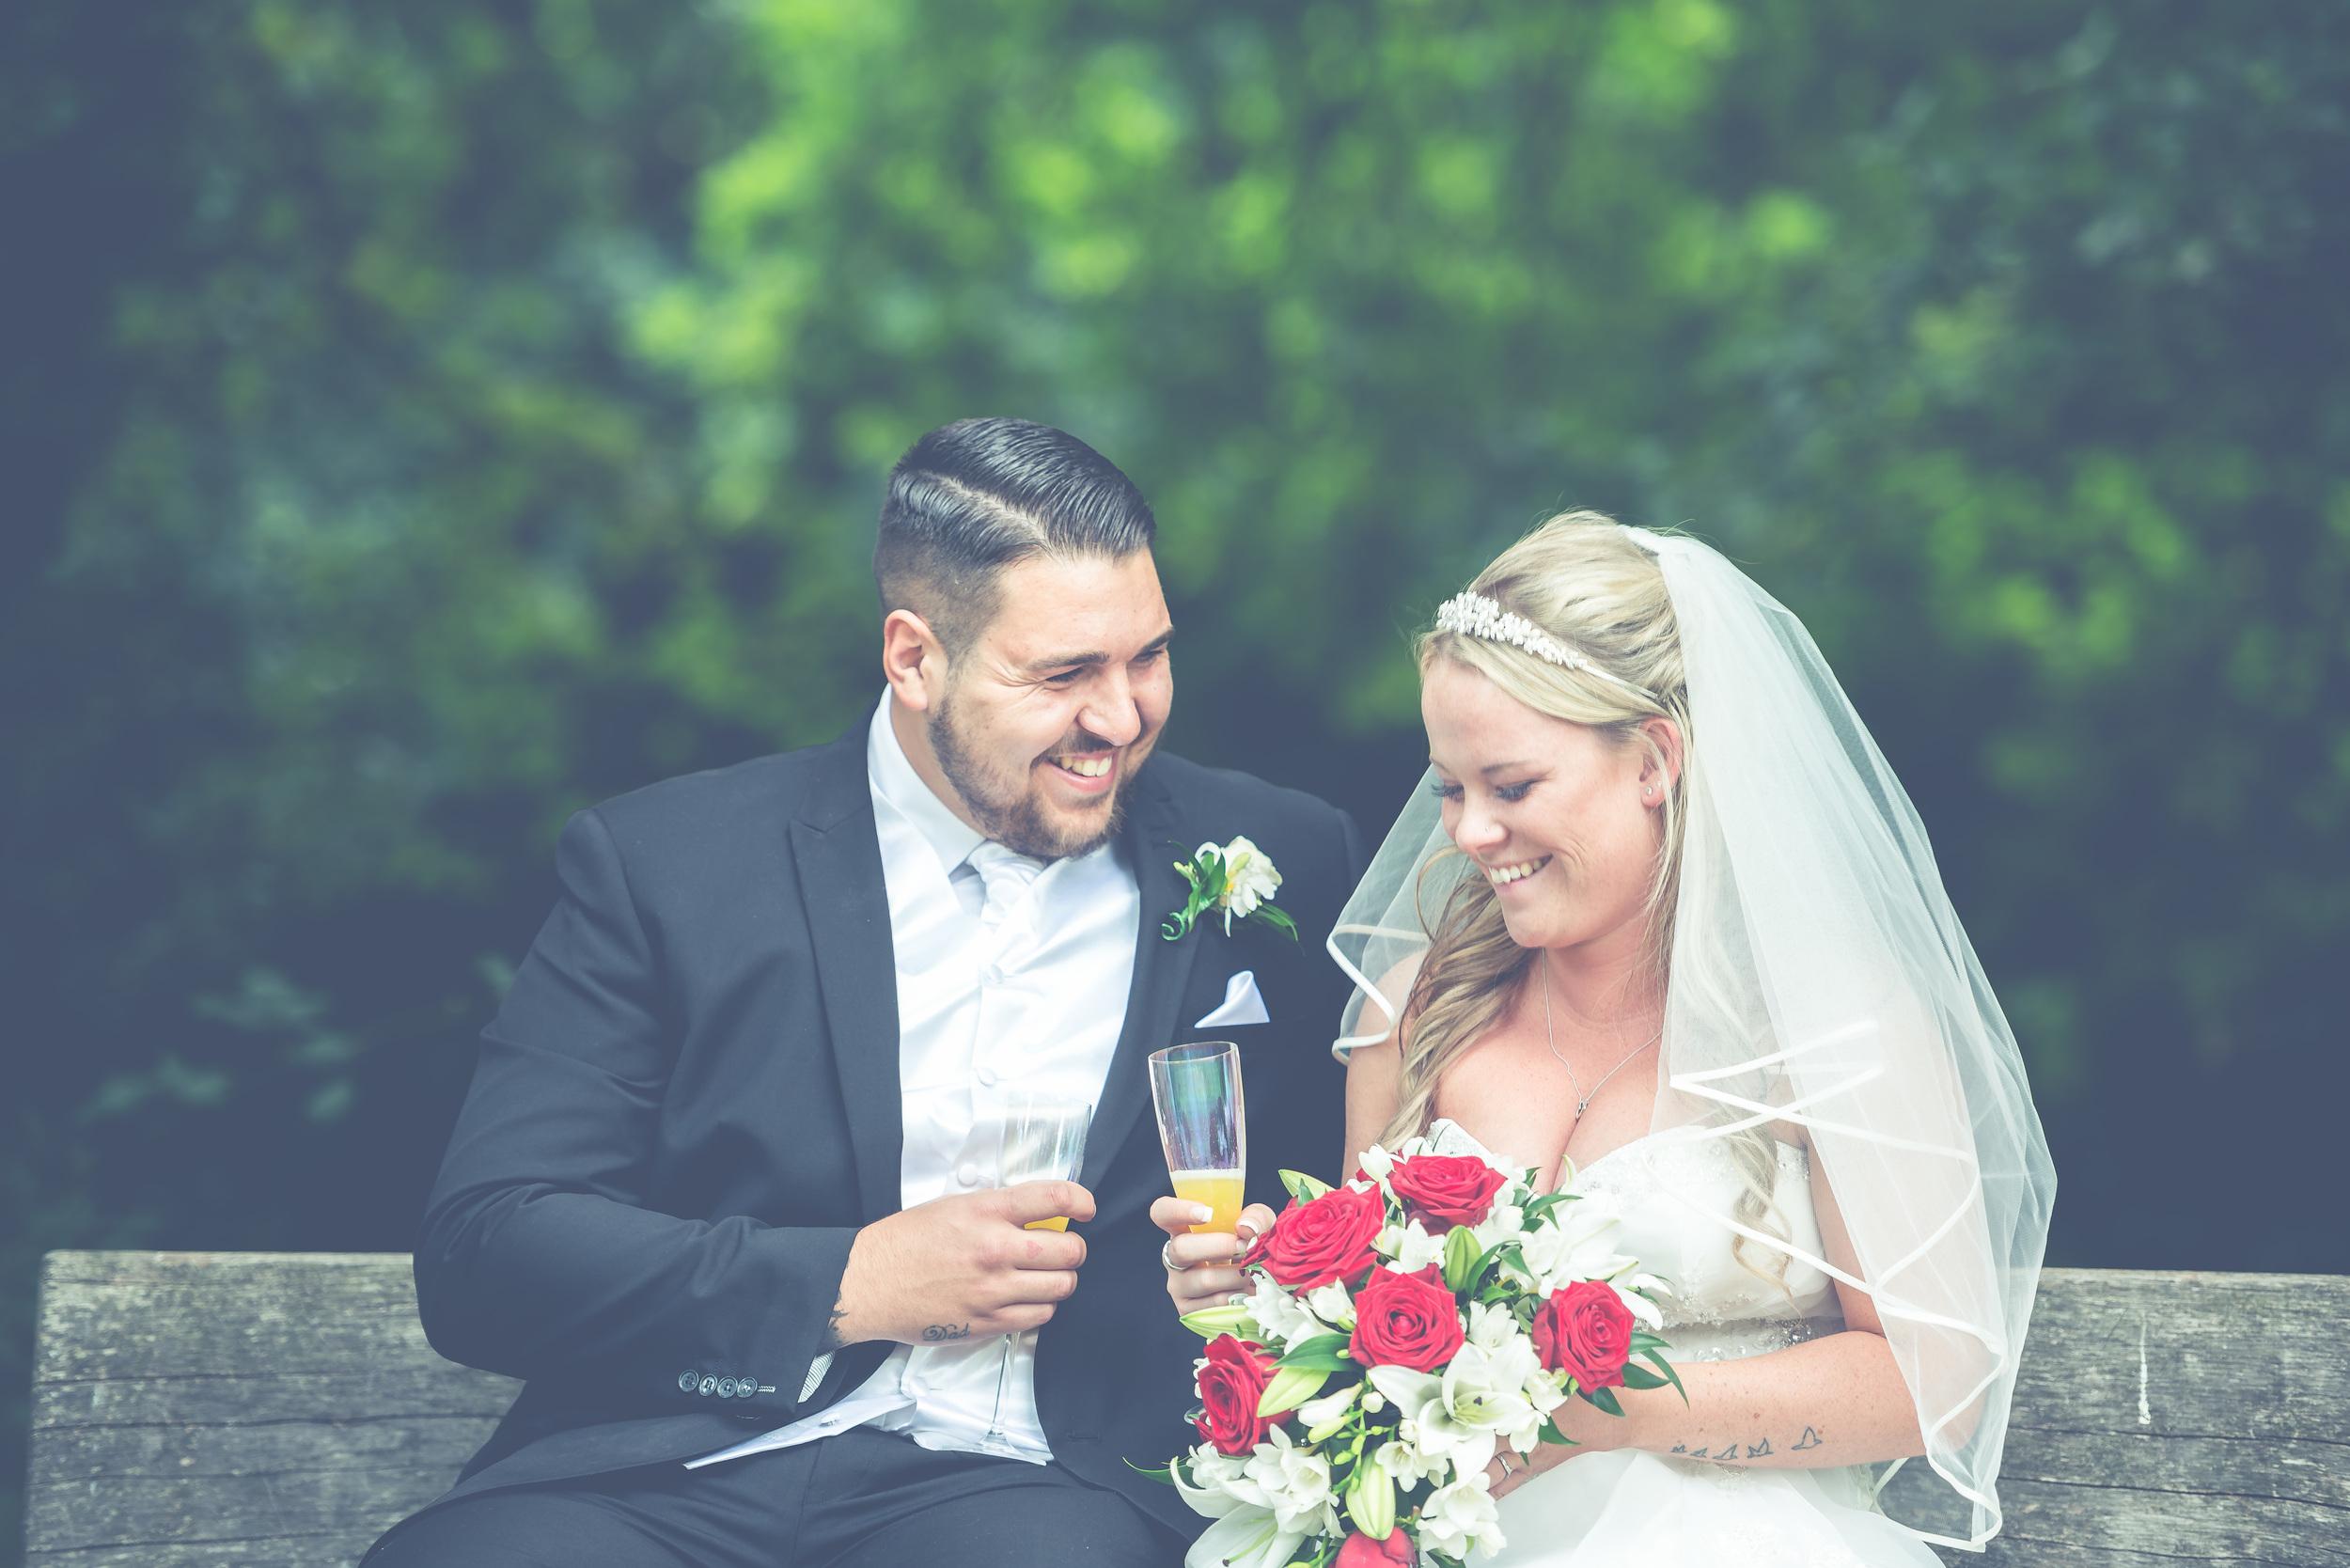 Farnborough Wedding Photography, Hampshire wedding photography, The Ely Wedding. Best Wedding photographer